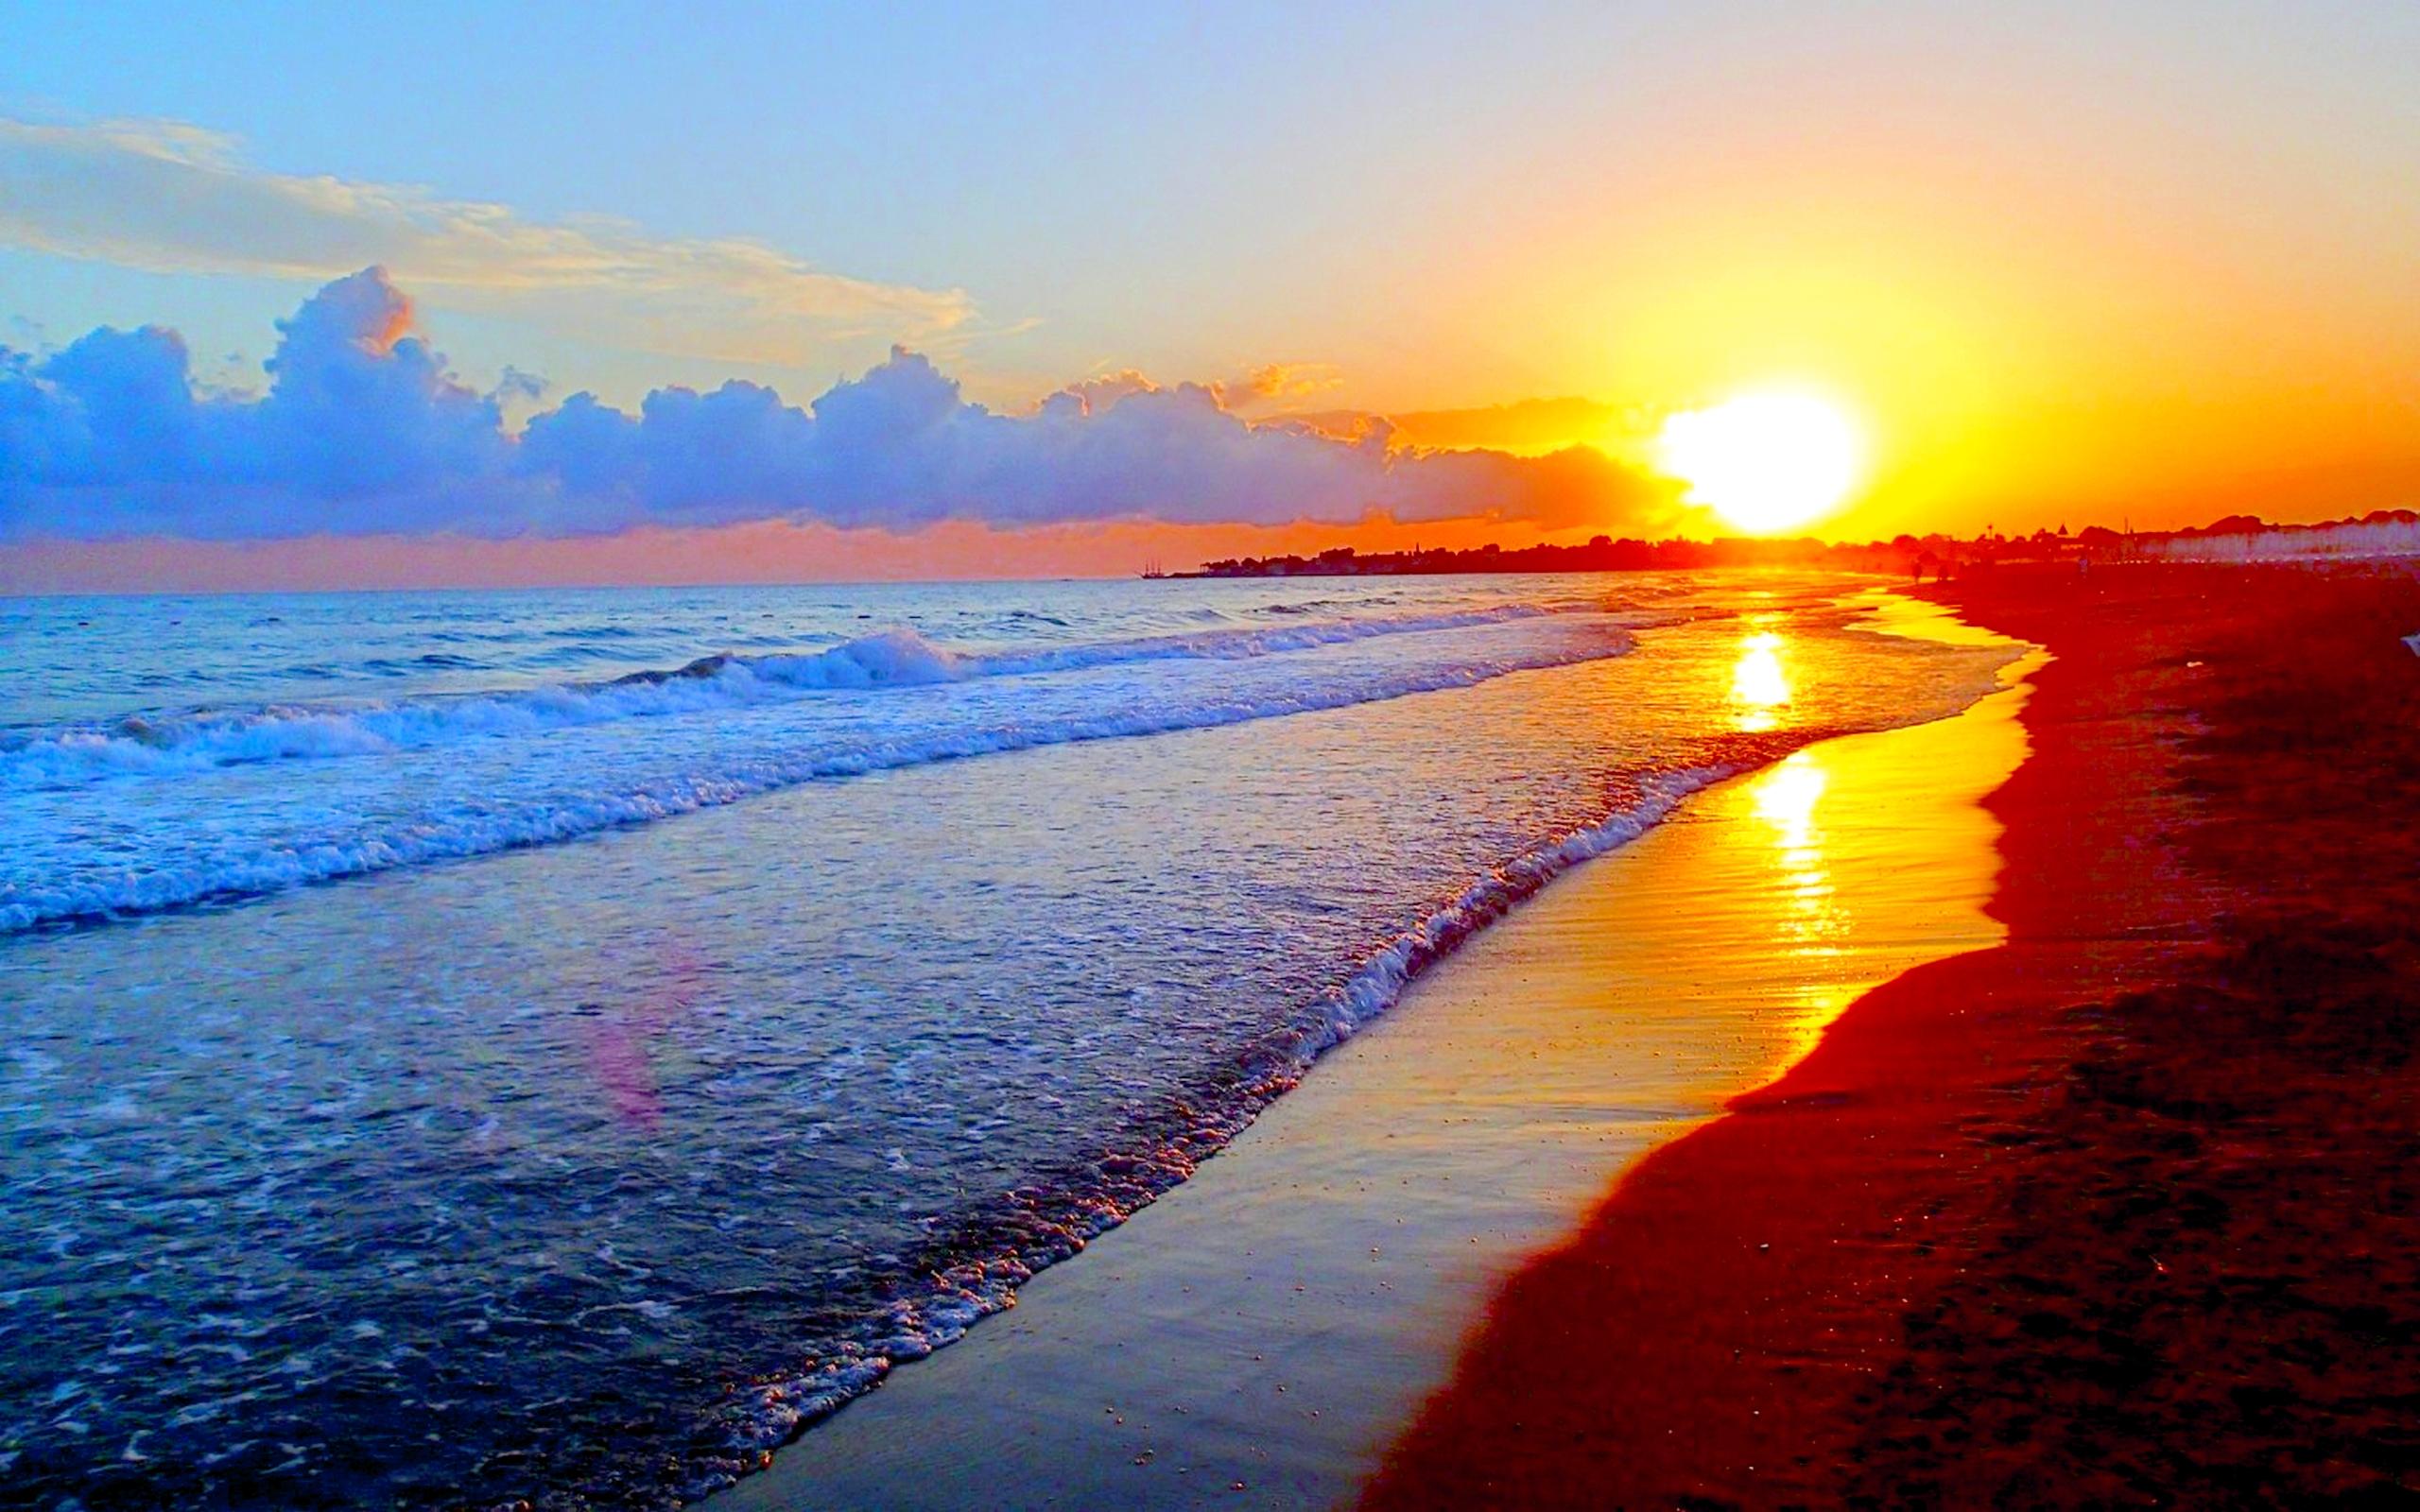 Summer Wallpaper HD download 2560x1600